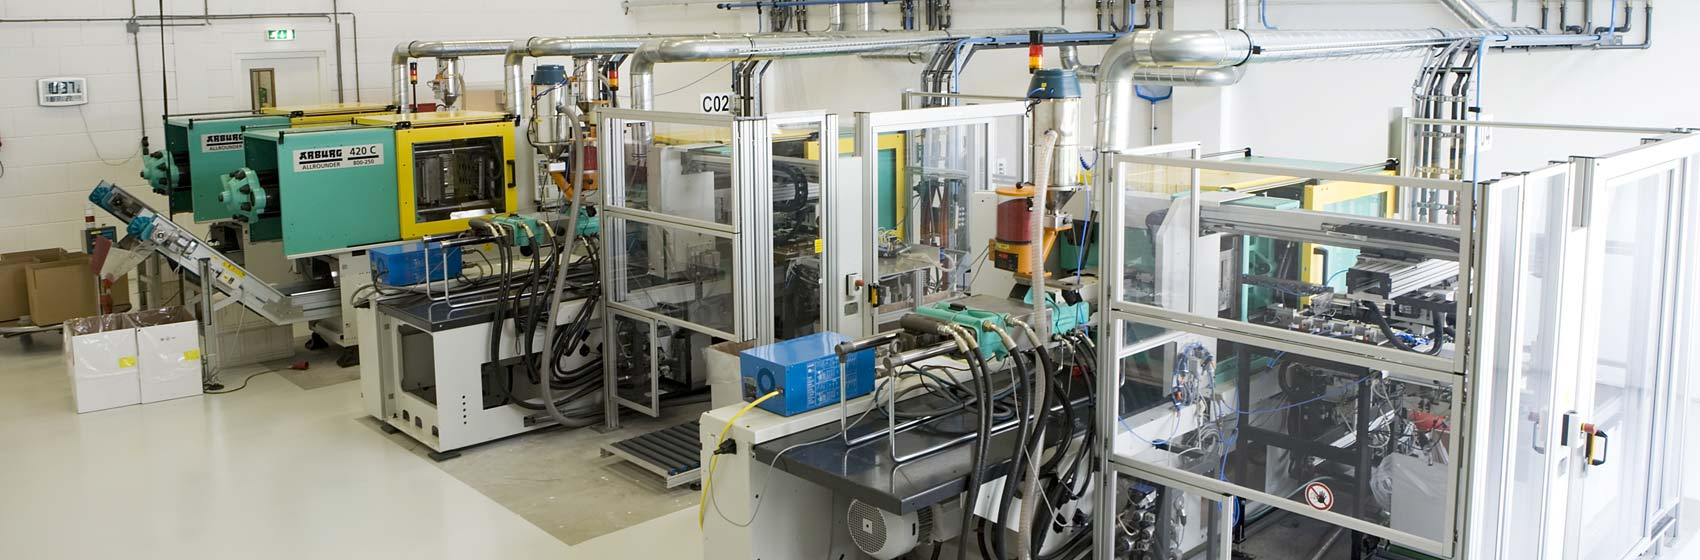 Cleanroom productie